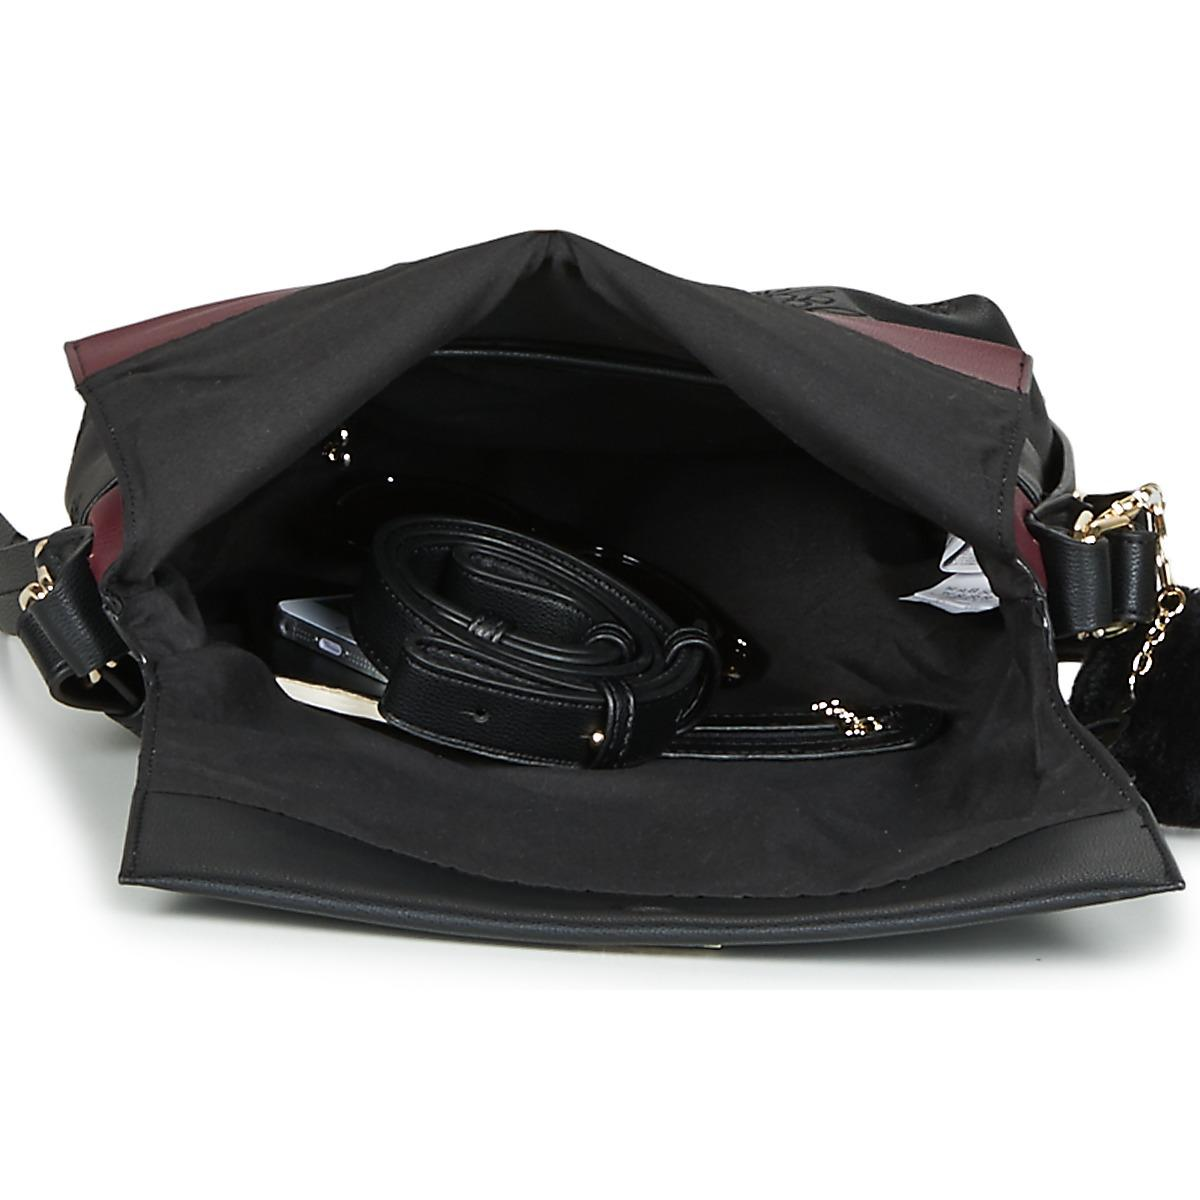 52f66ac8f0 Desigual Bols Aleida Mini Kiev Women s Shoulder Bag In Black in ...